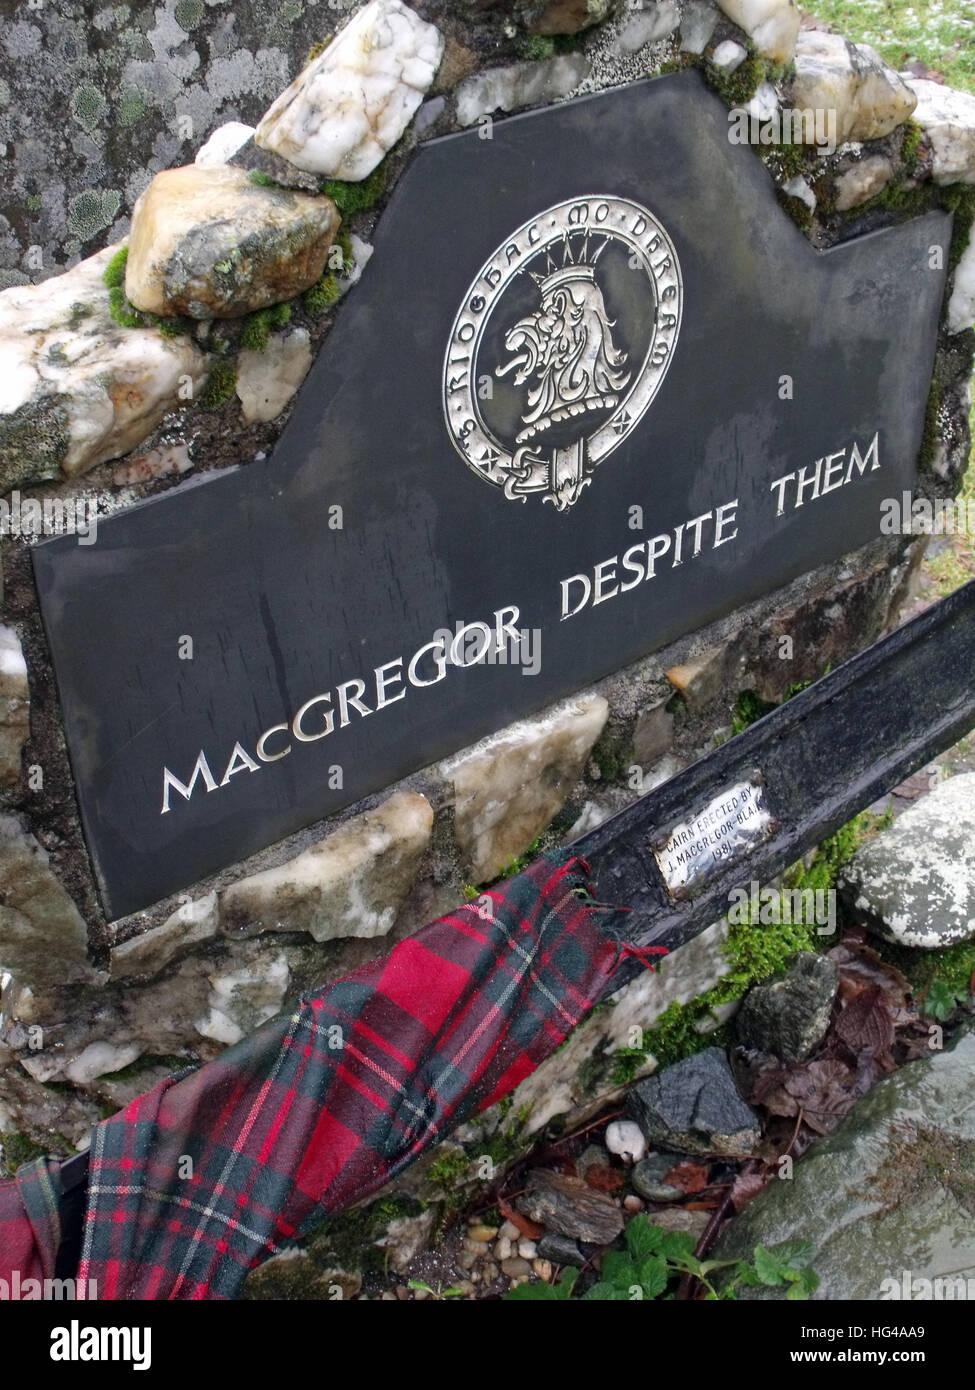 Nationalism,Roy,MacGregor,red,hair,haired,hero,martyr,outlaw,Balquidder,Inverlochlarig,Beg,graveyard,burial,buried,tomb,Robert,MacGregor,Despite,Them,tarten,tartan,crest,Scottish